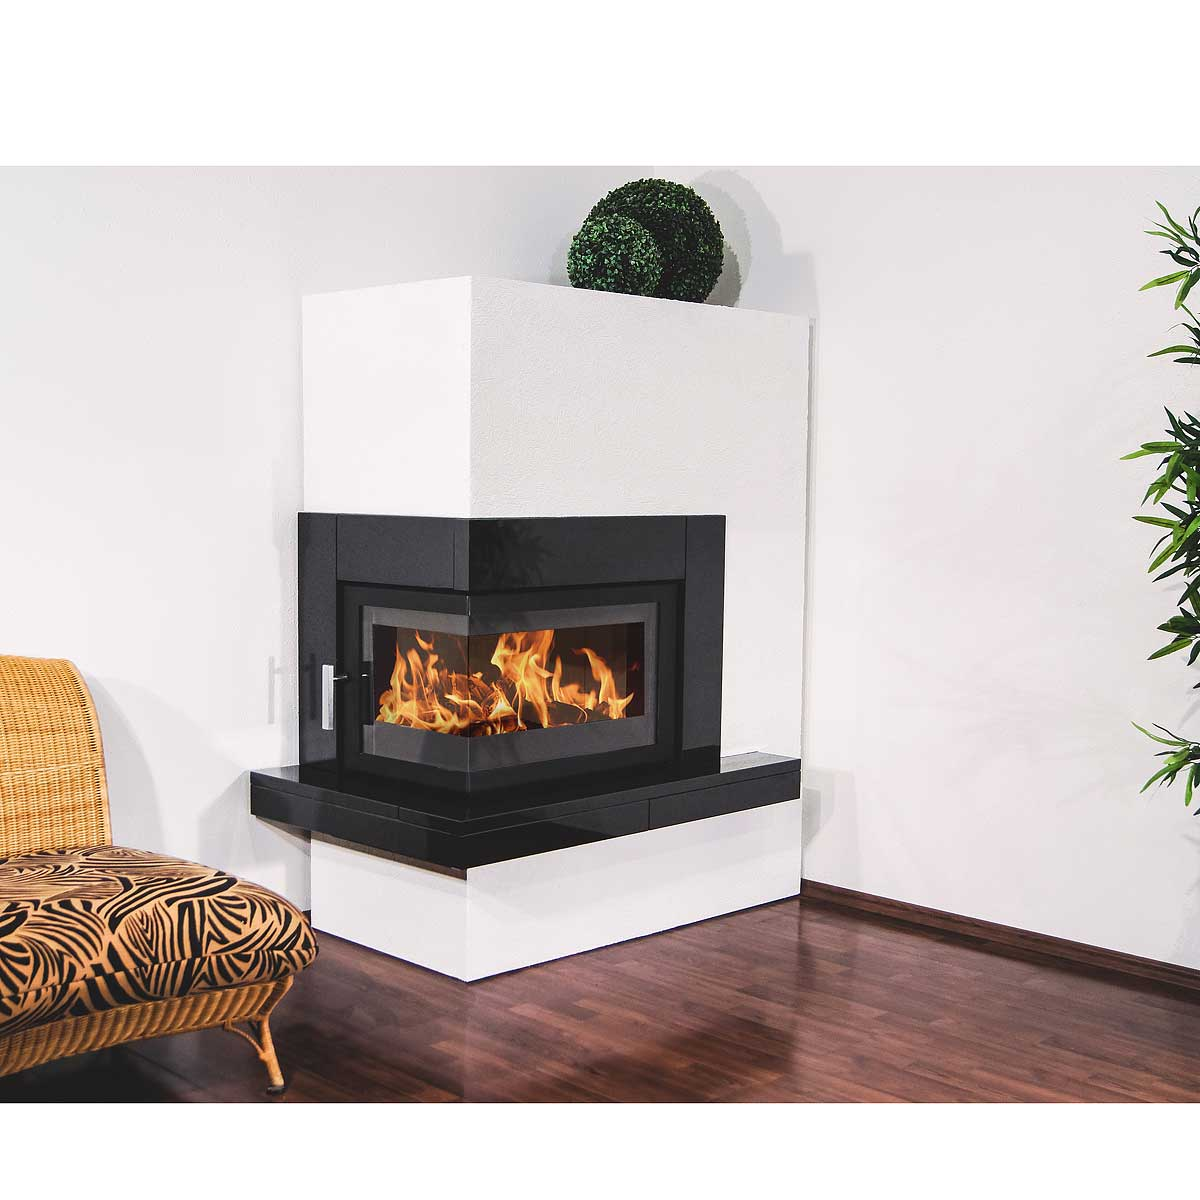 kaminofen pateo links granit schwarz 559131 freytool. Black Bedroom Furniture Sets. Home Design Ideas